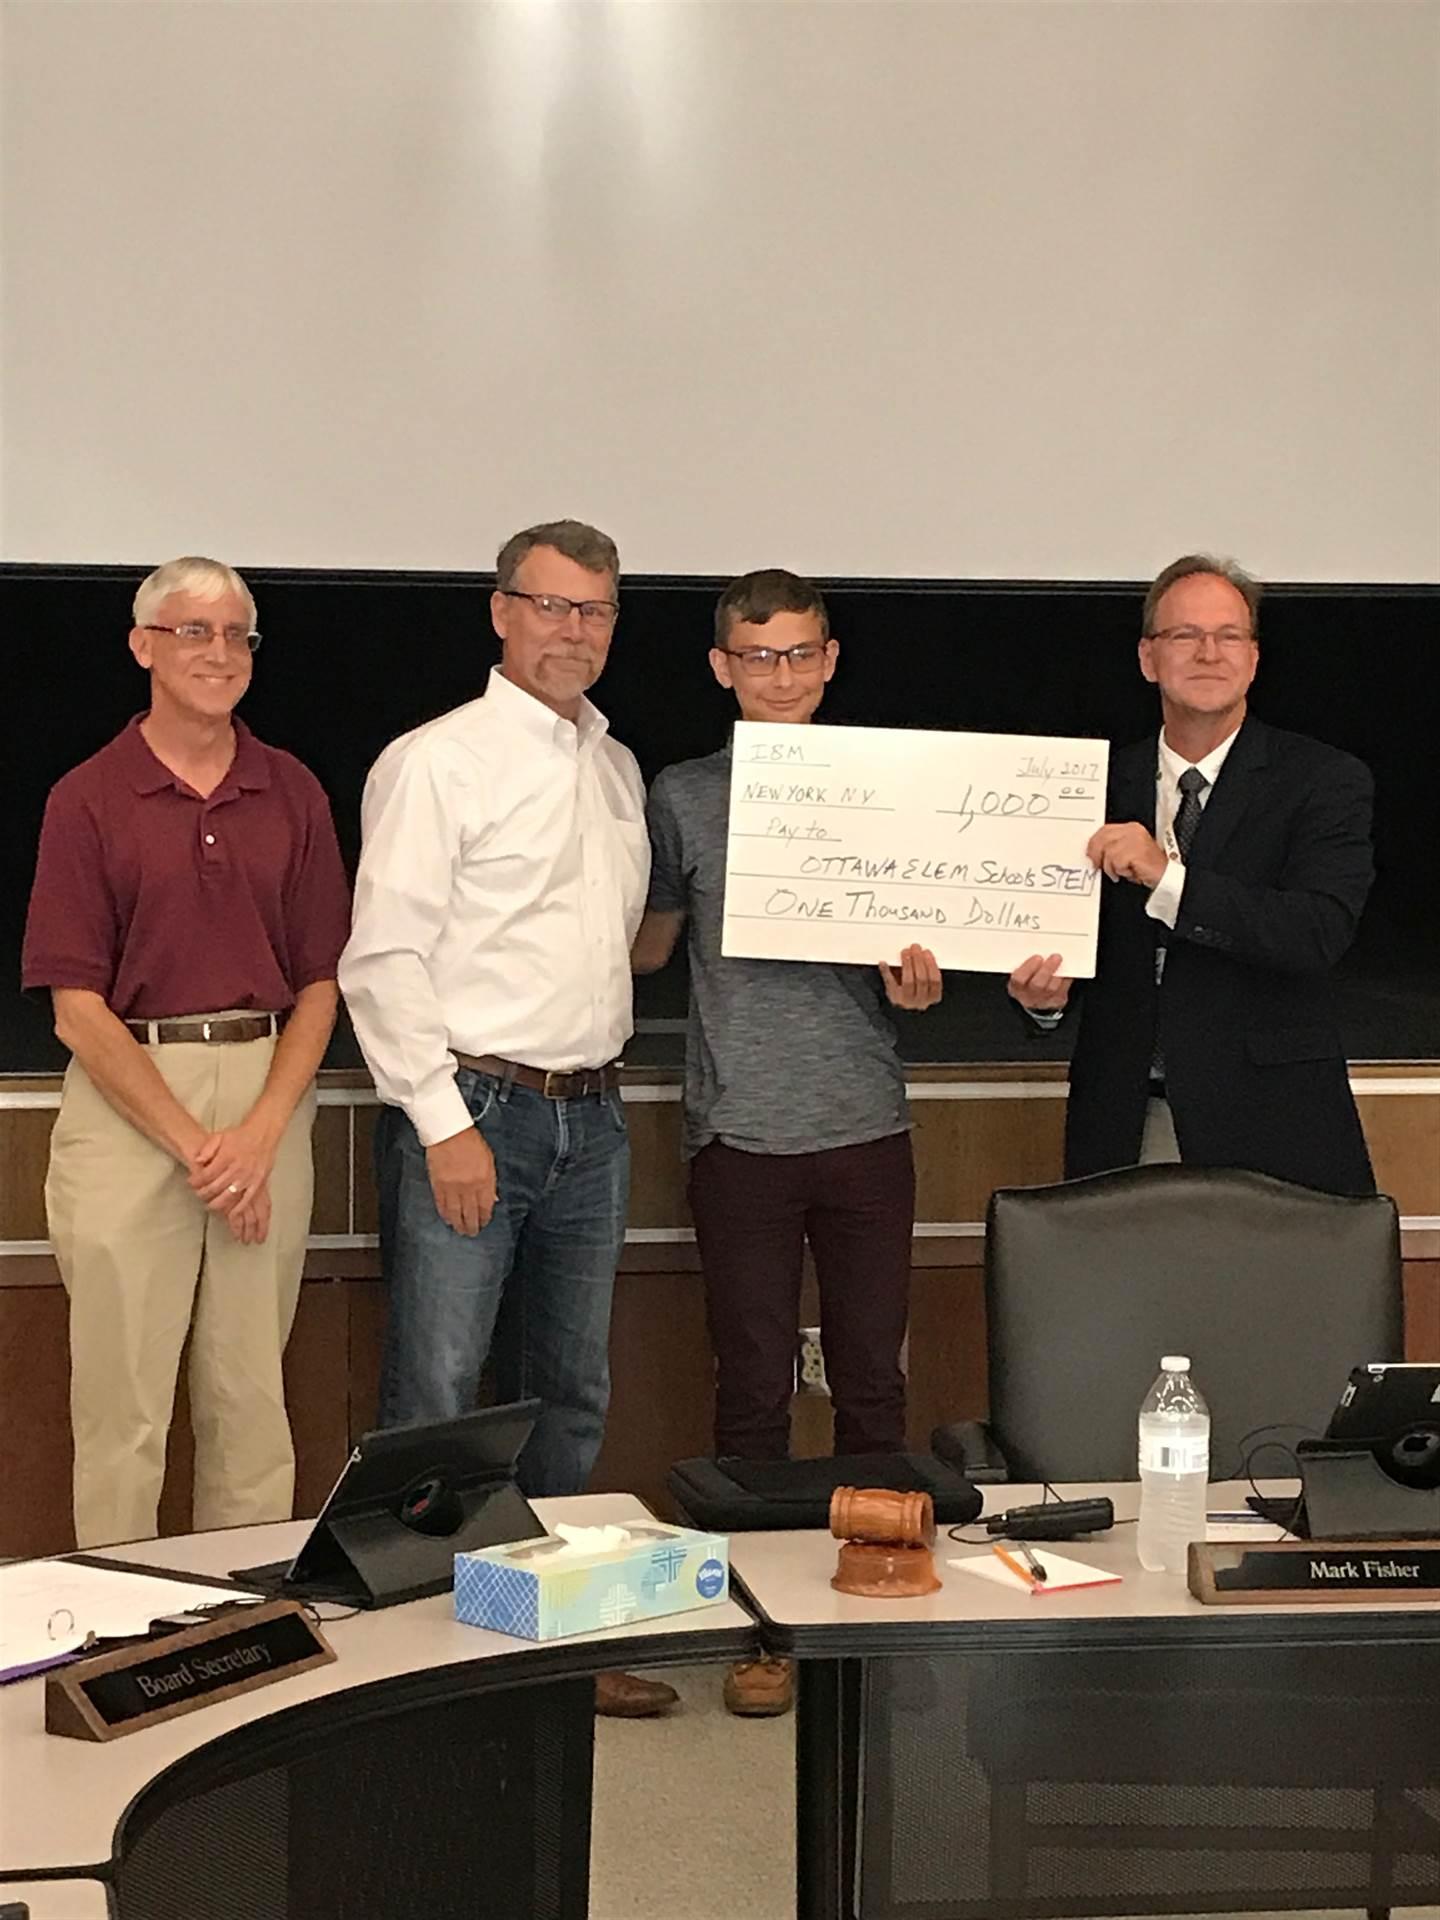 1,000 IBM Community Grant